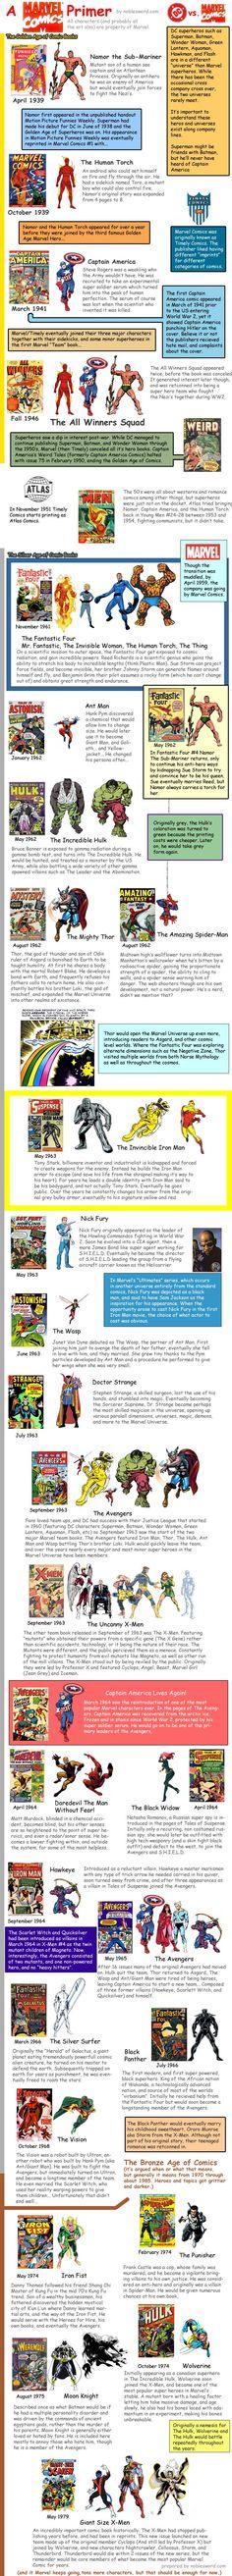 Tremendously Huge Marvel Comics Infographic - Avengers Movie Prep | NobleSword